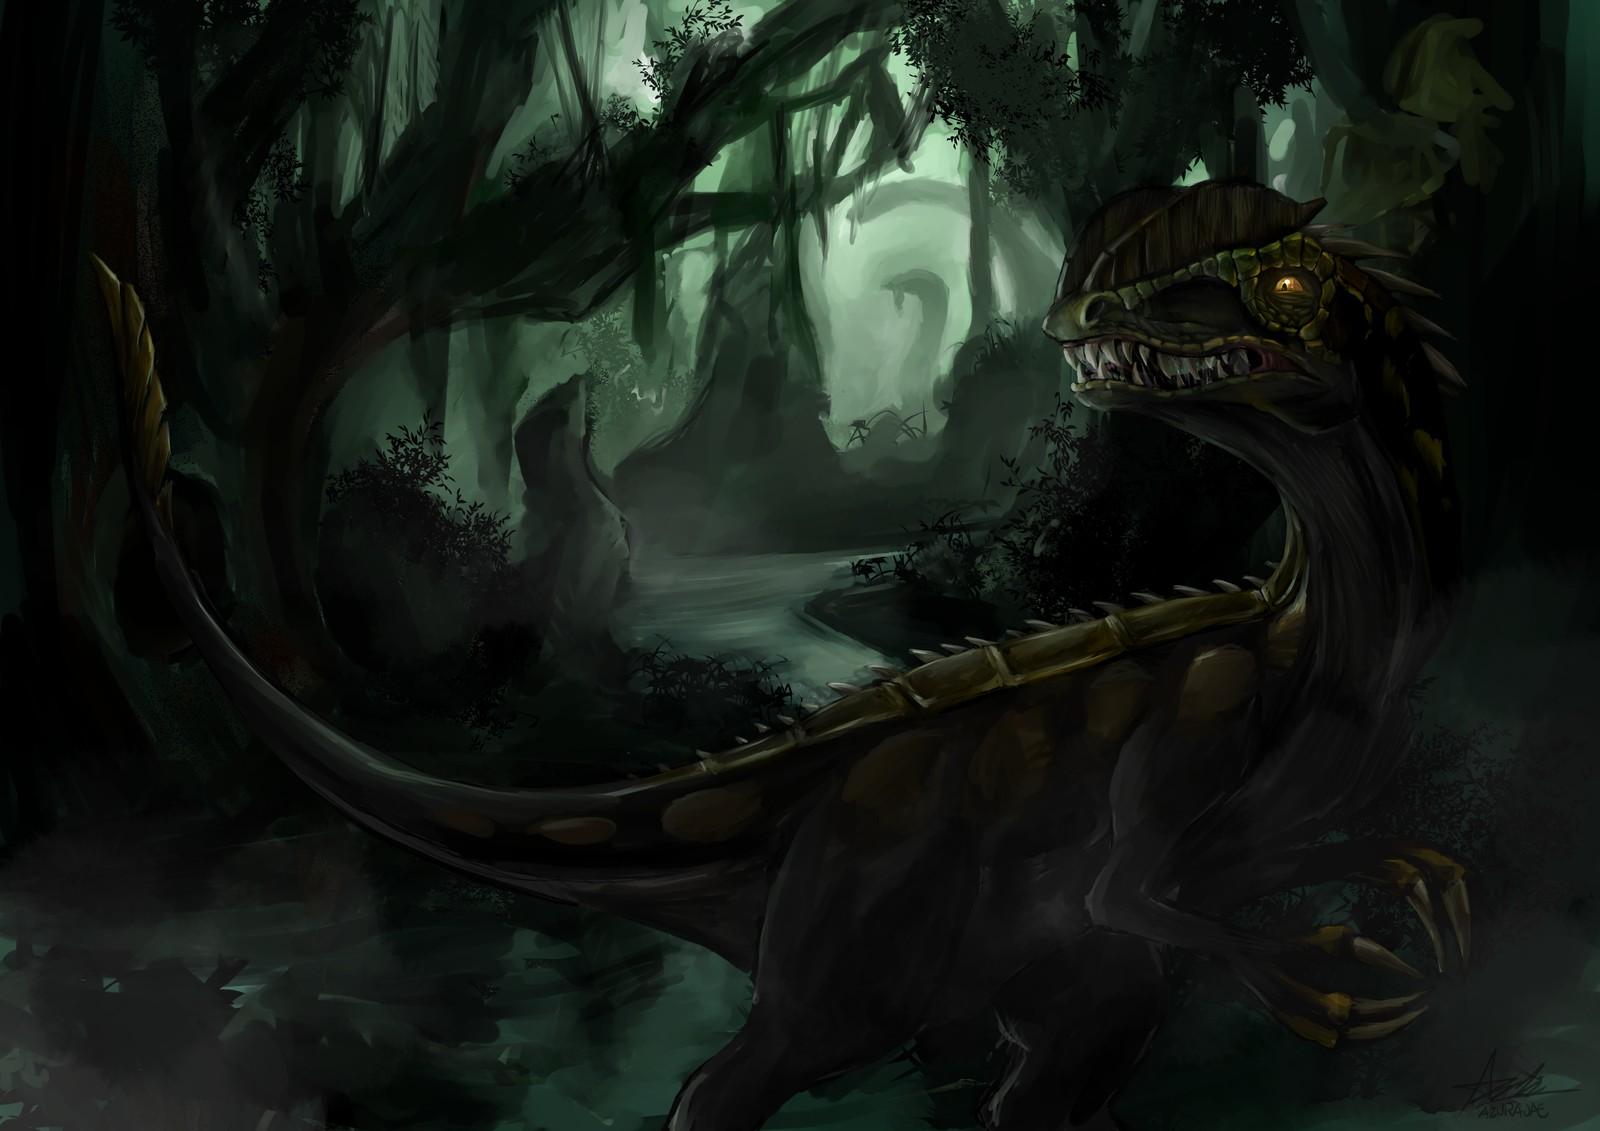 Swamp Dilophosaurus